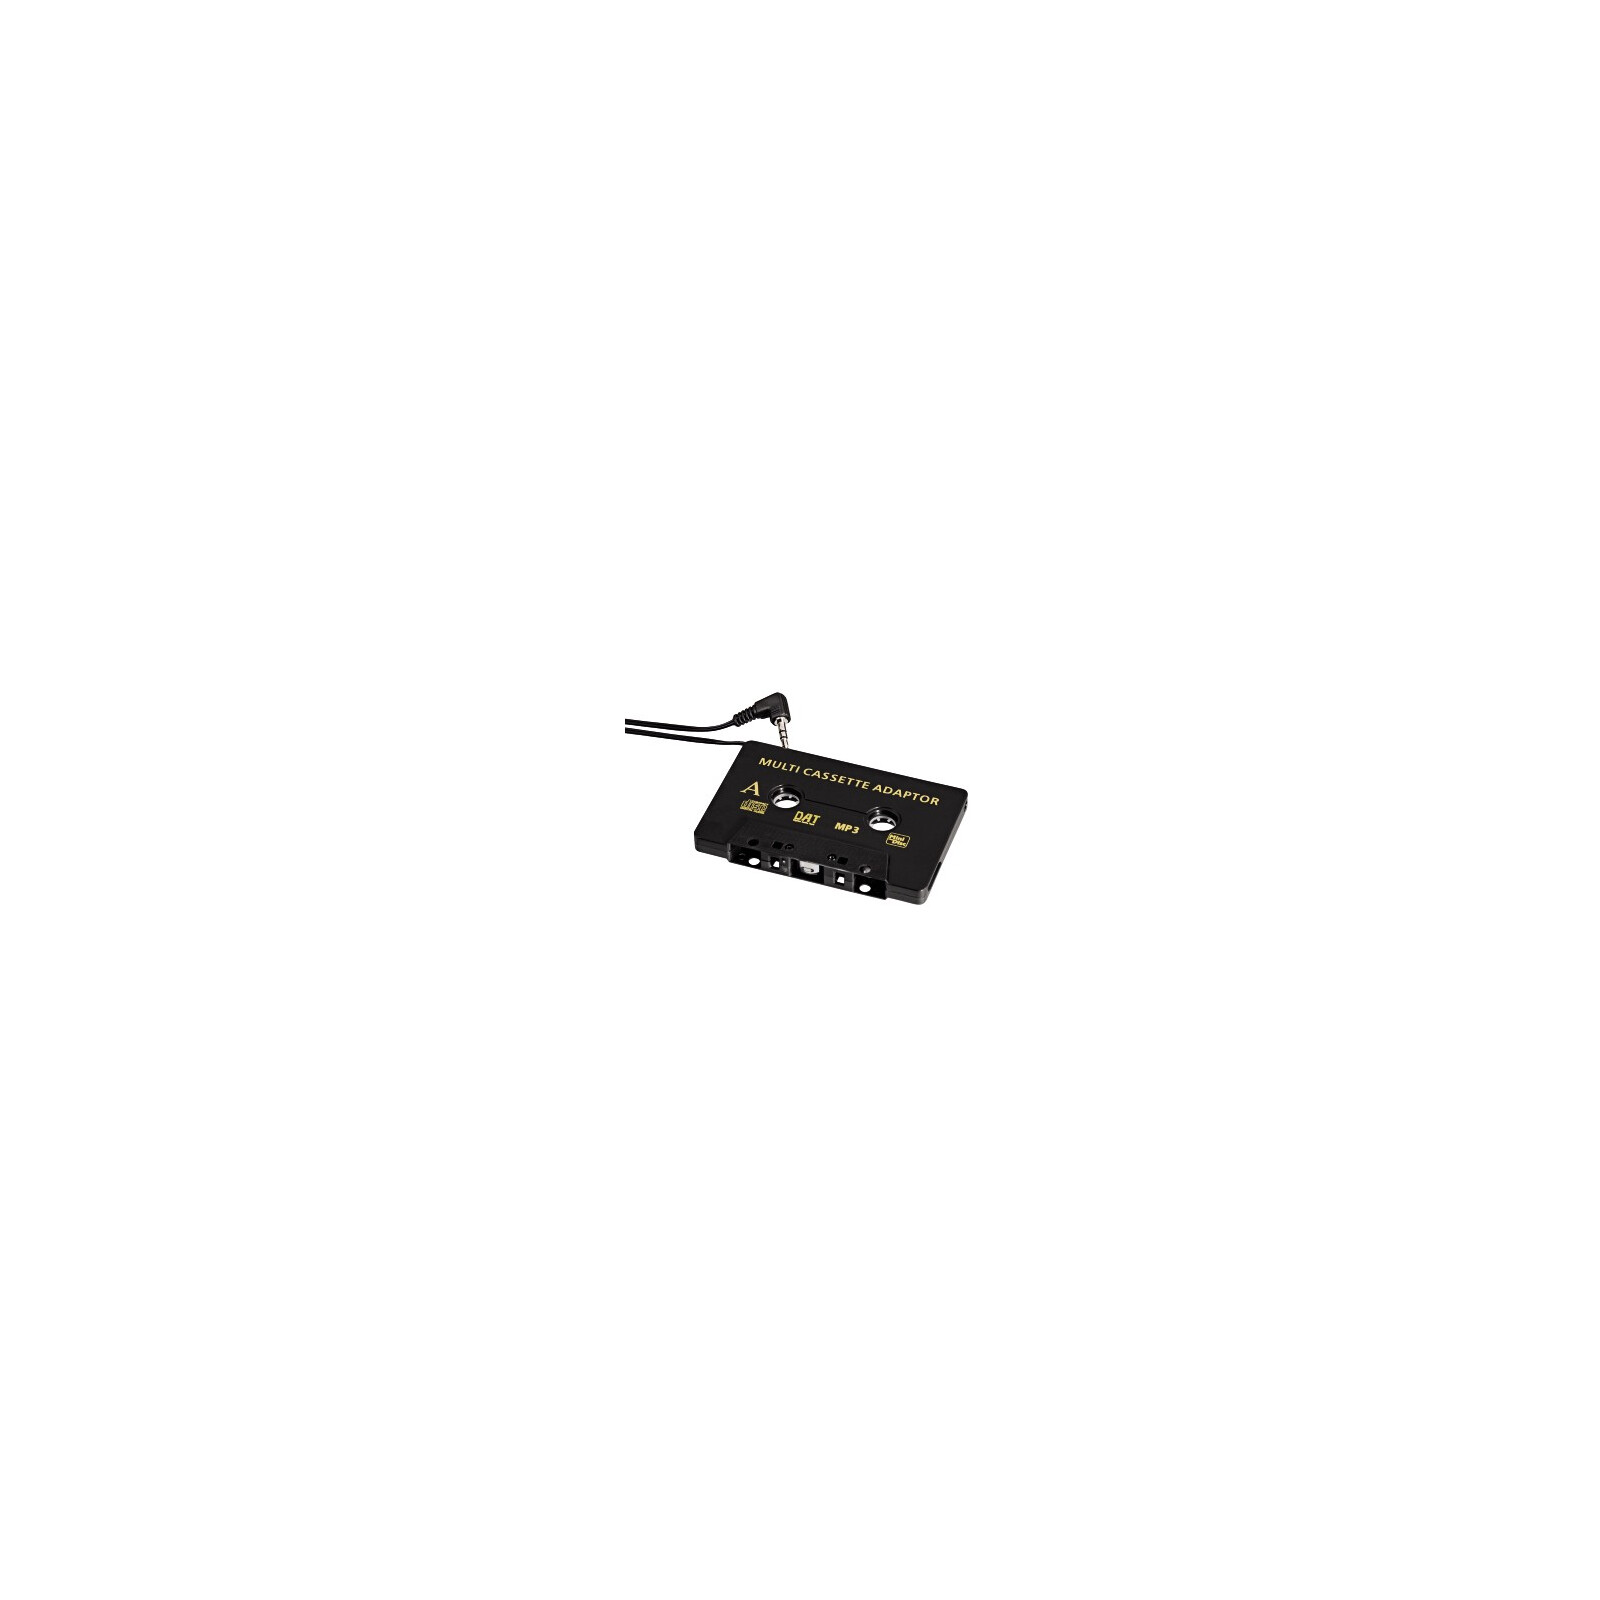 Hama 17524 KFZ-Kassettenadapter Smartphones/MP3